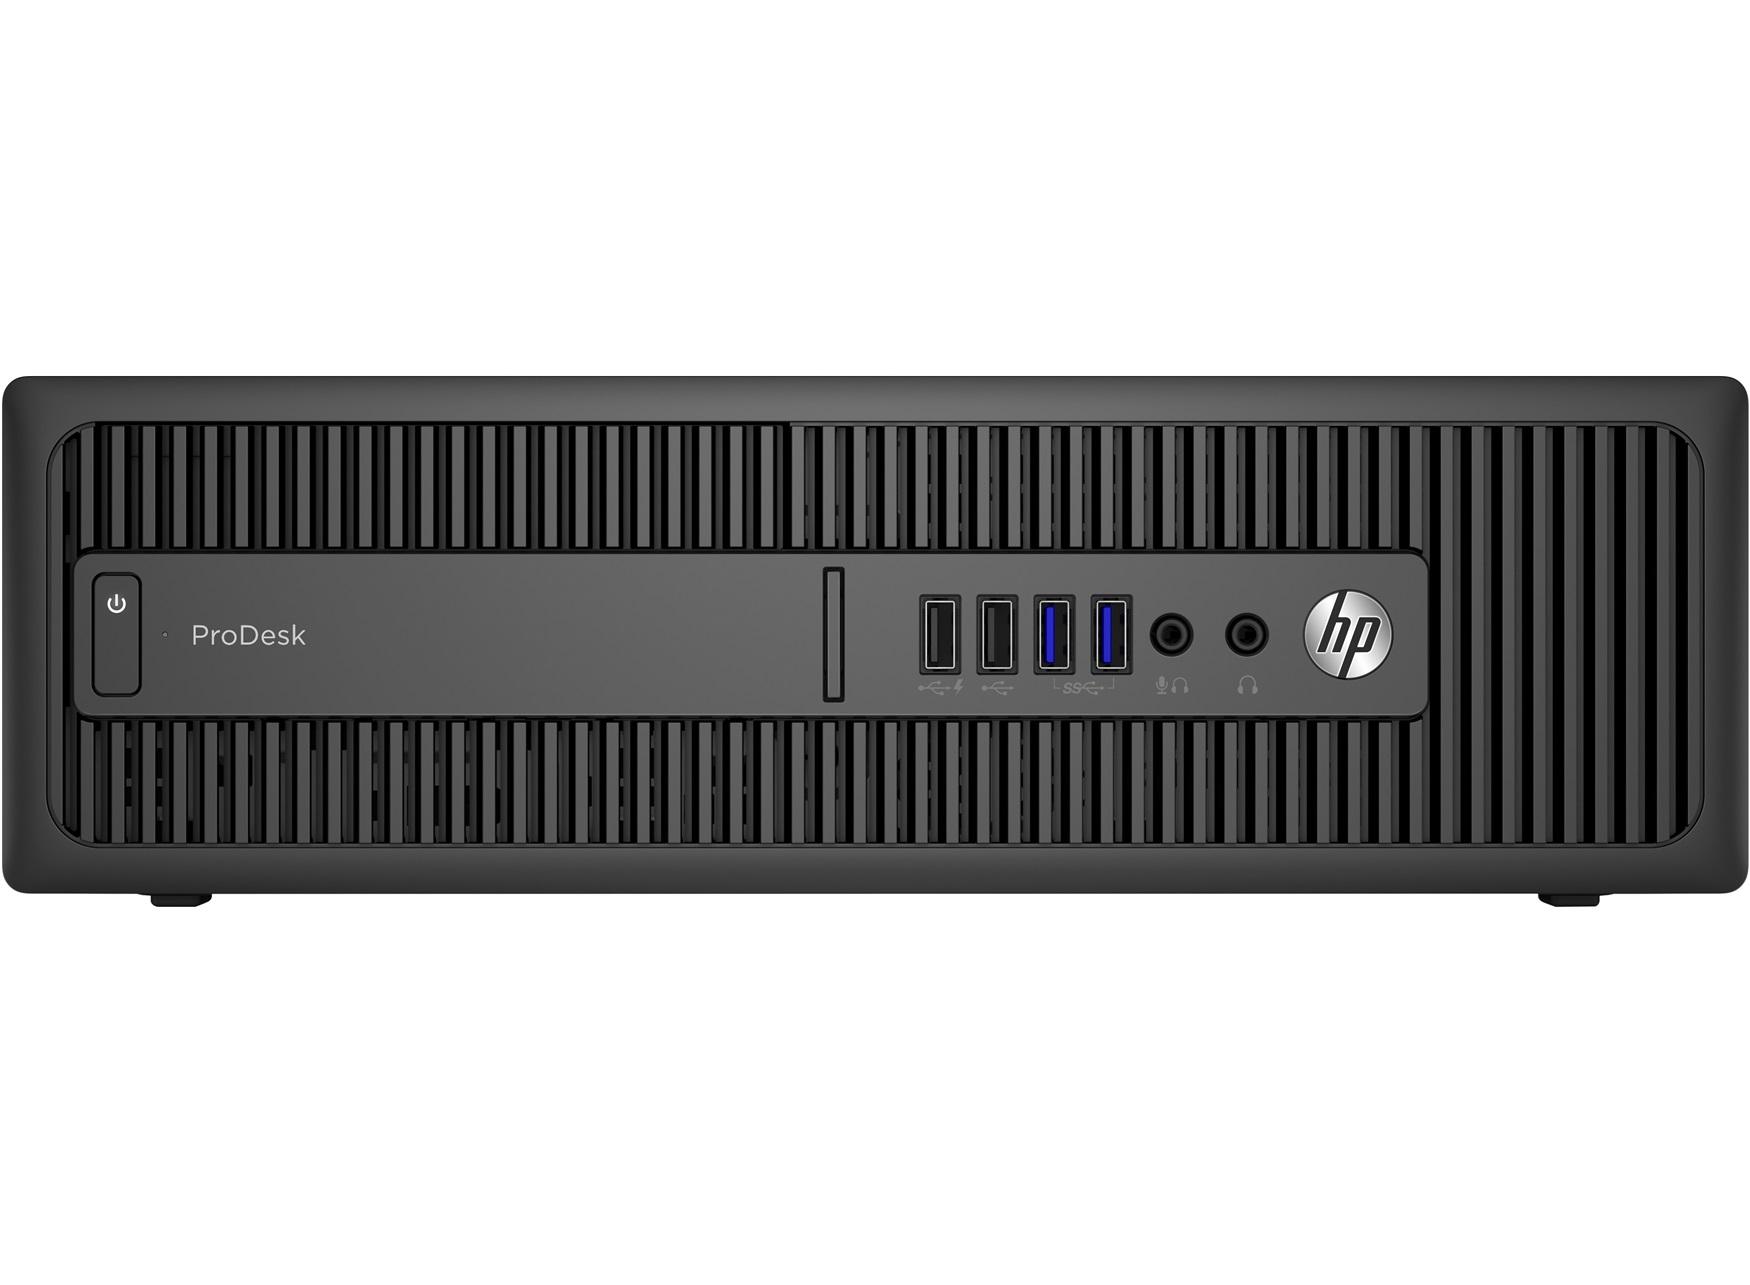 HP ProDesk 400 G3 3.4GHz i7-6700 SFF Black